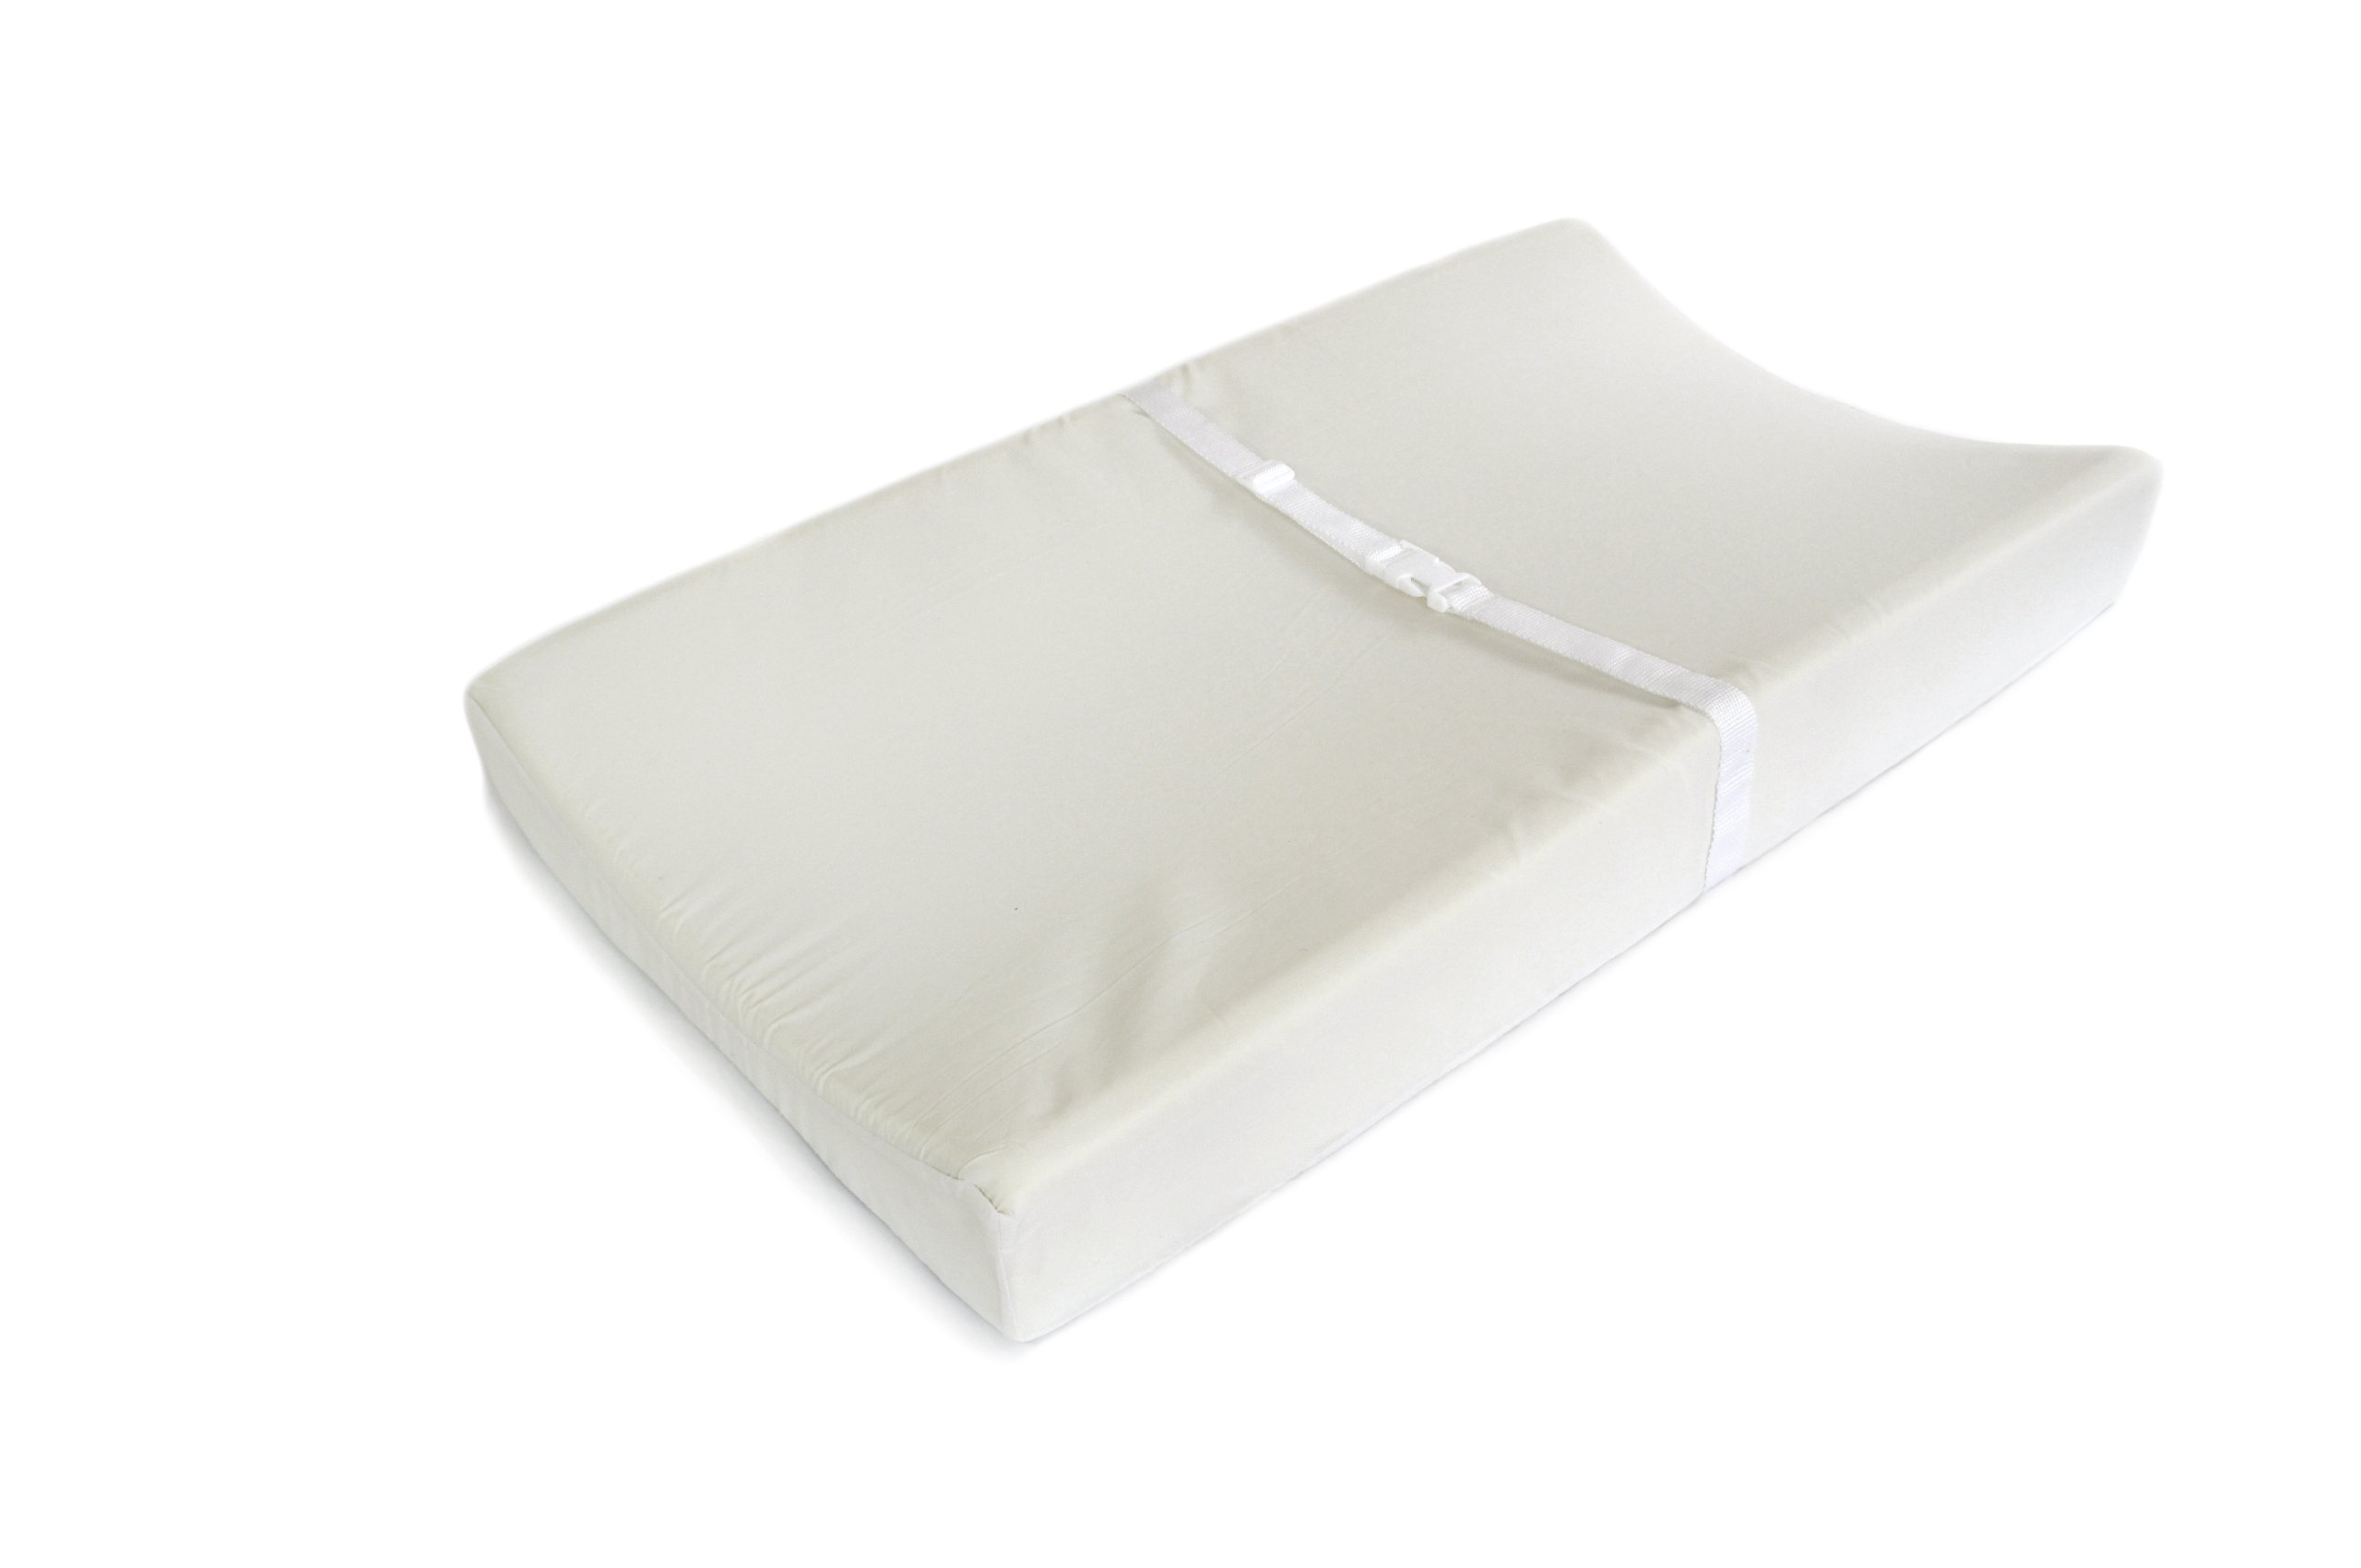 The Ark Memory Foam Changing Pad